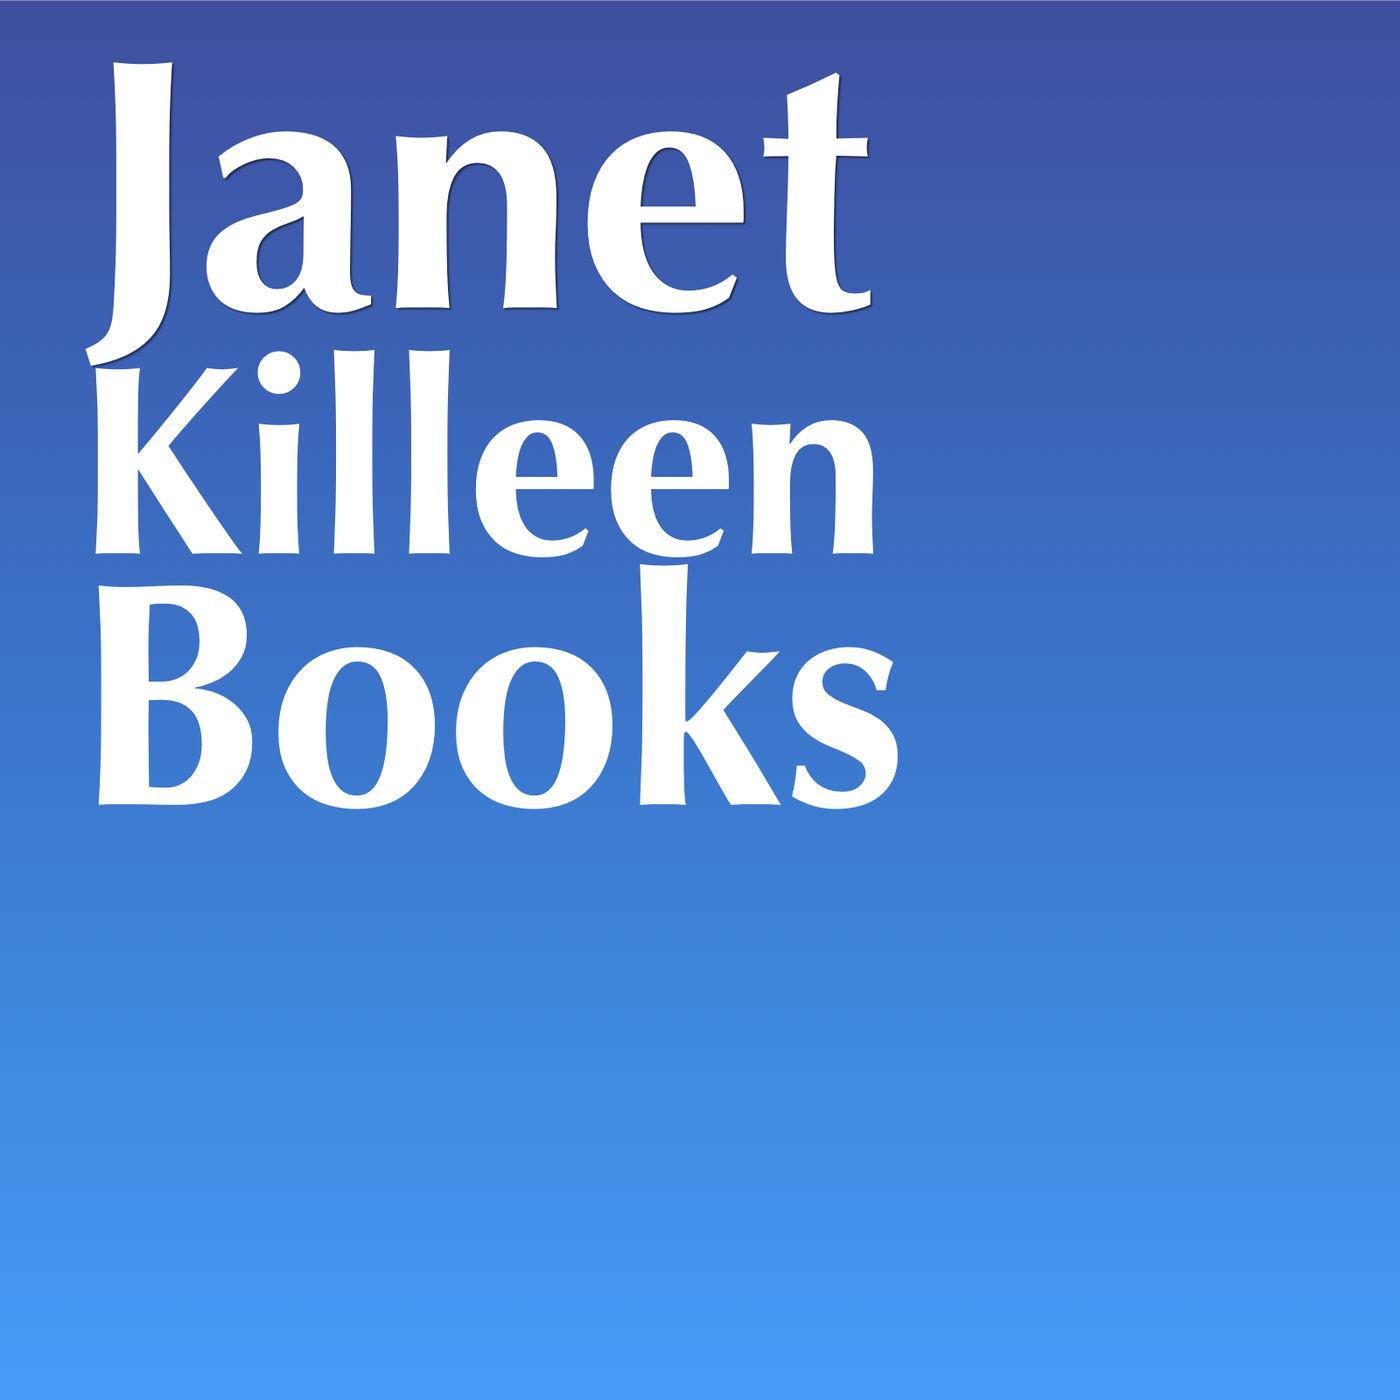 Janet Killeen Books